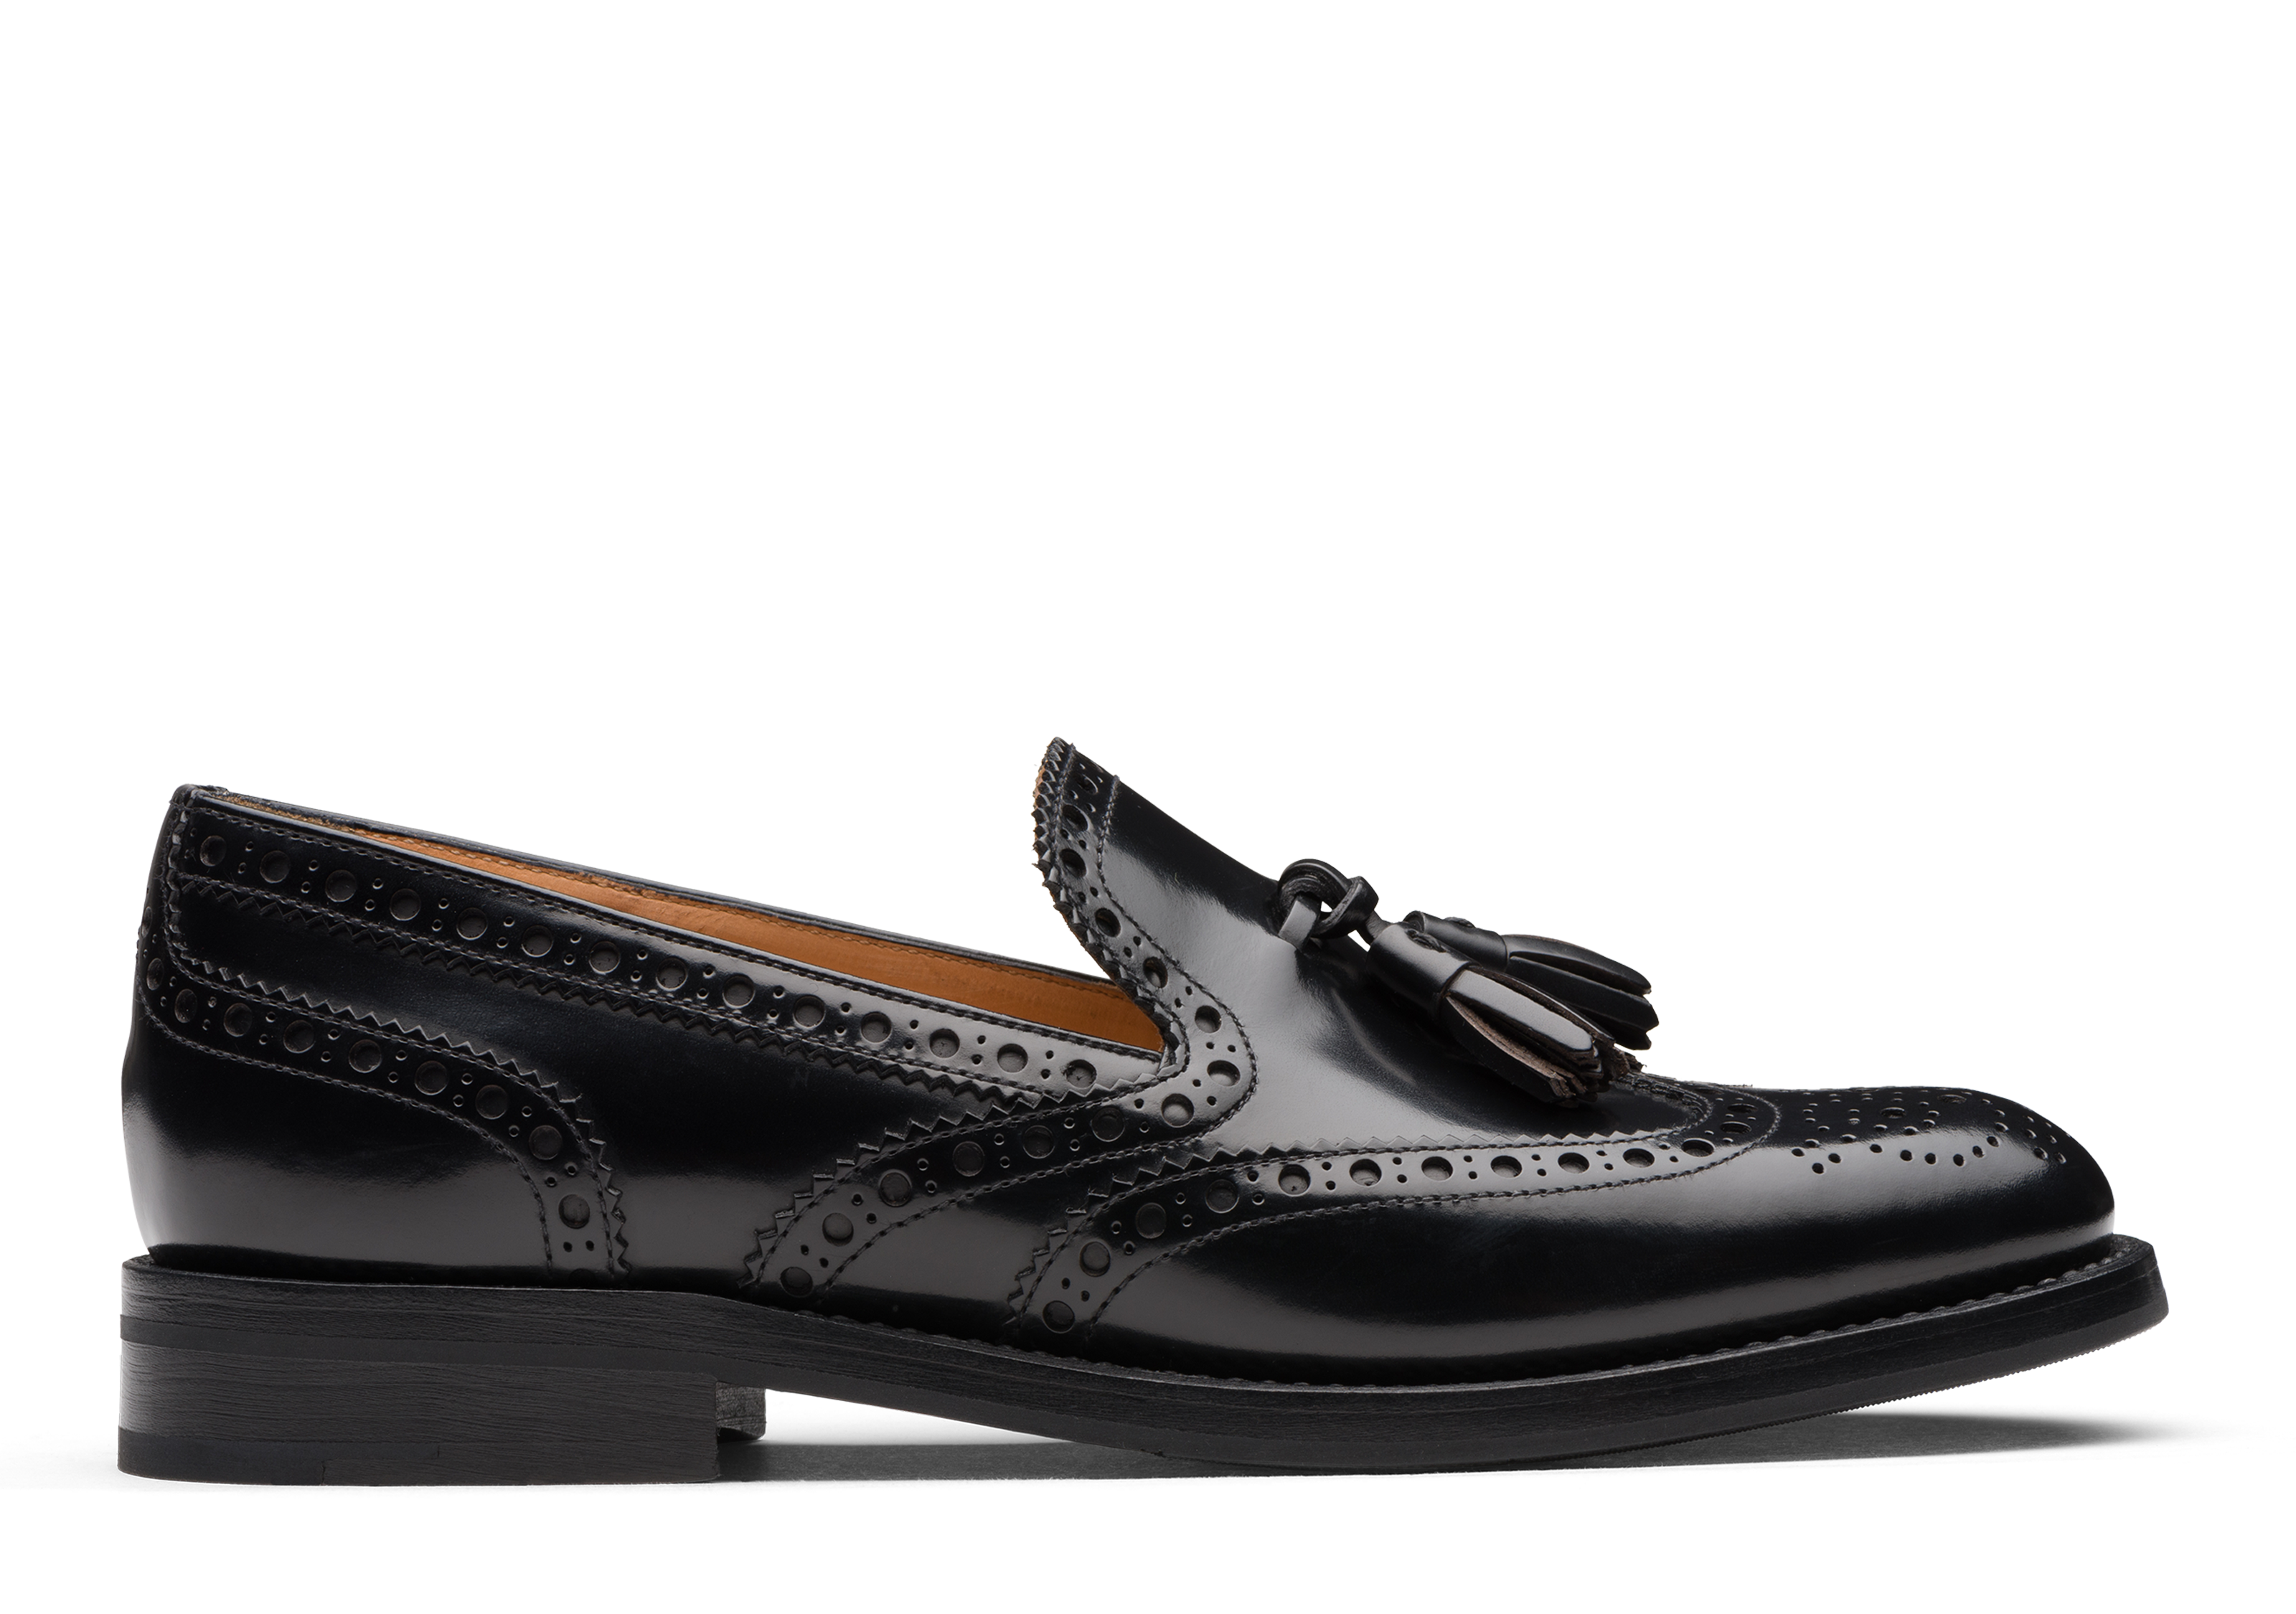 07ede657db2a6 Church's women's shoes and accessories | Church's